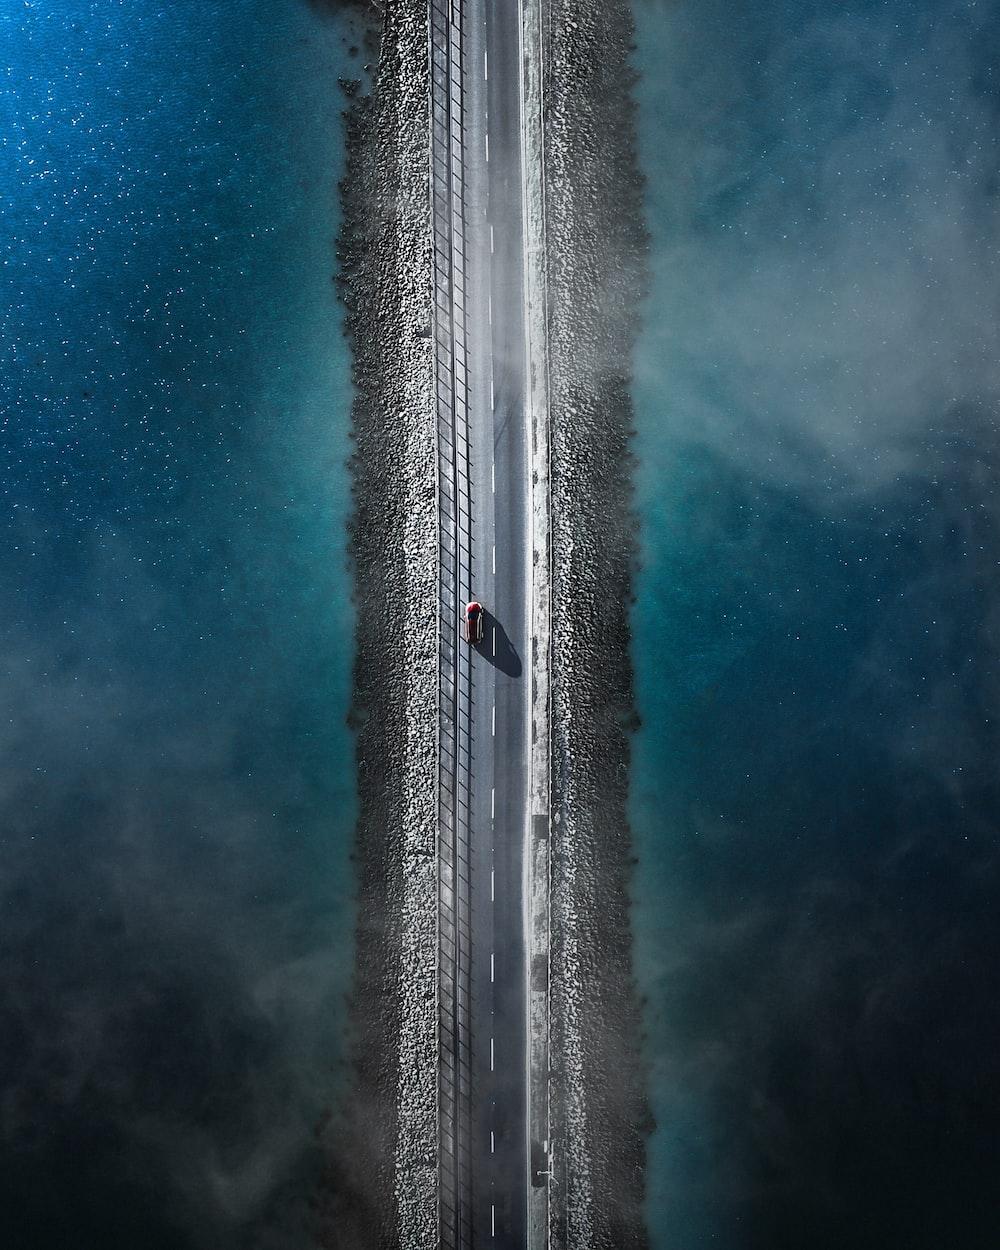 bird's eye view photo of car on asphalt road between body of water